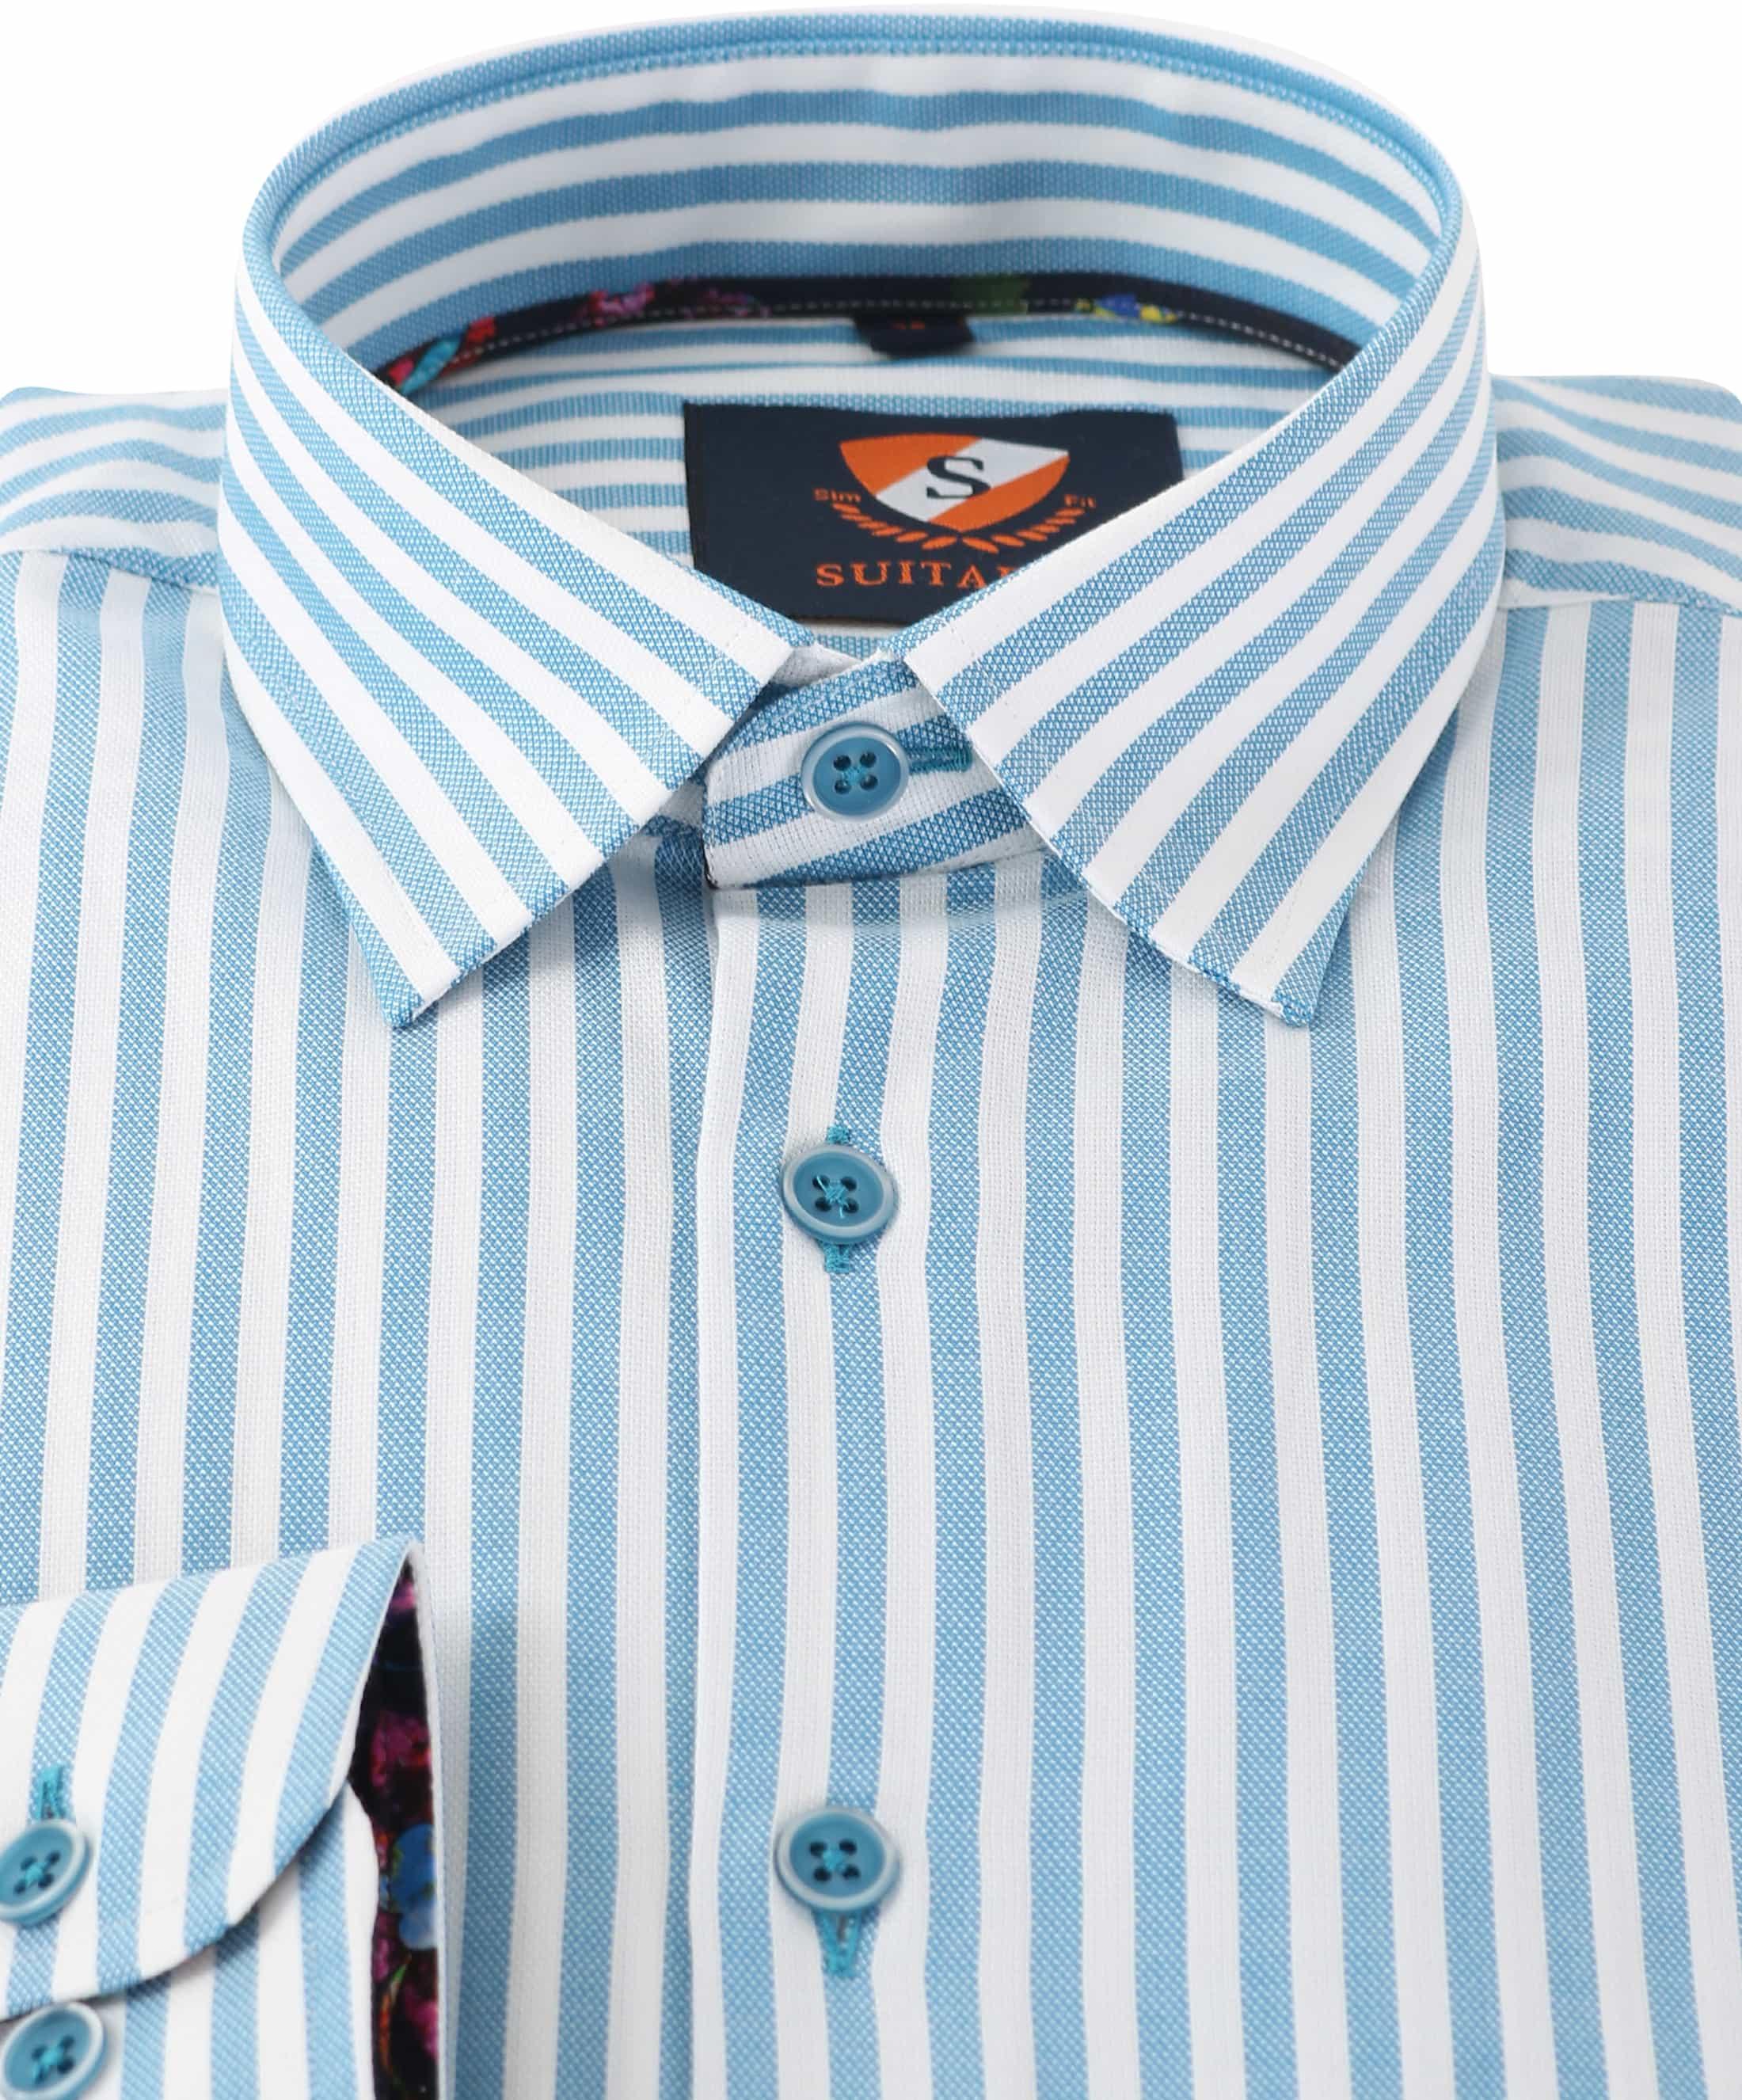 Overhemd Blauw Streep 154-4 foto 1